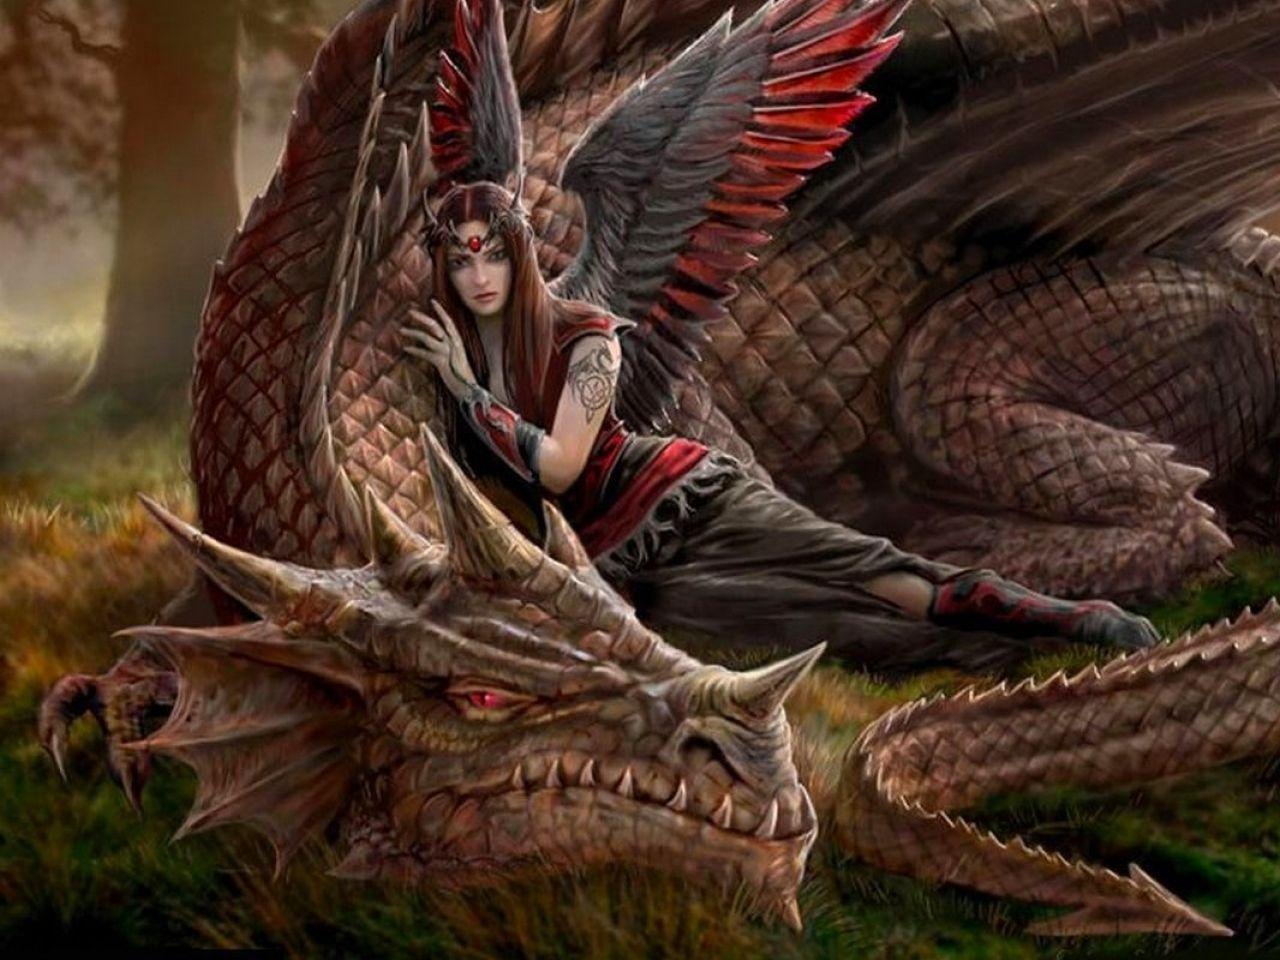 Free Dragon Art Wallpaper Dragons Fantasy Art 1280x800 Wallpaper Wallpaper Free Wallpapers Fairy Dragon Dragon Pictures Fantasy Dragon